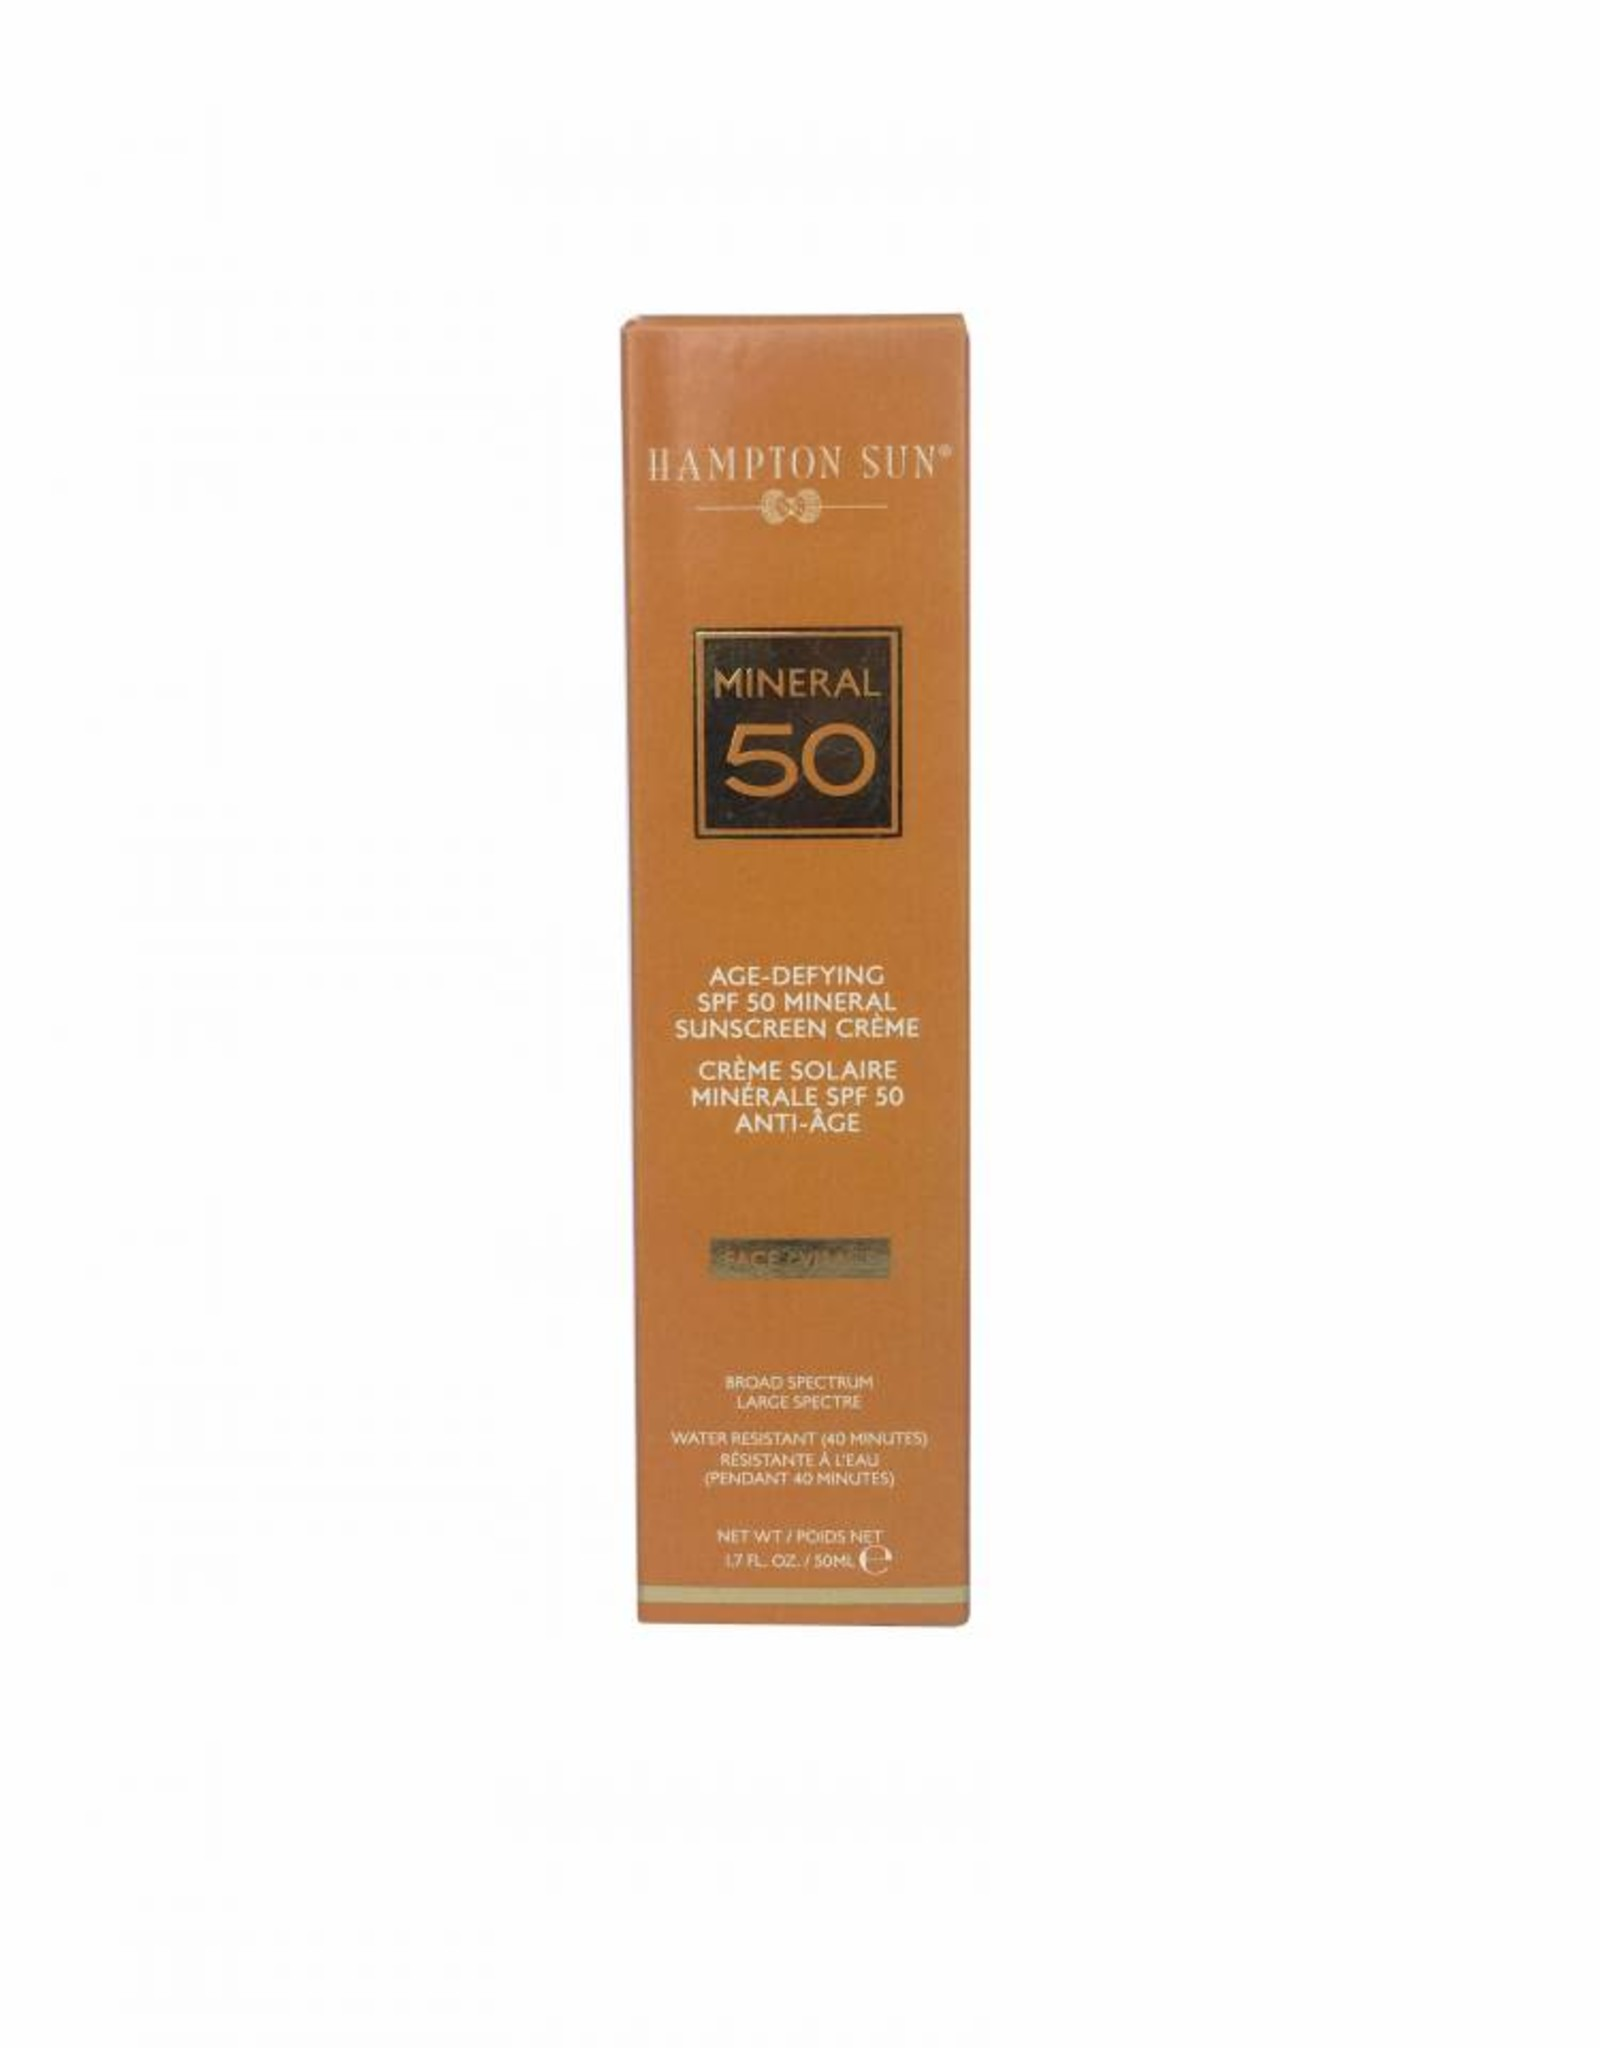 Hampton Sun Age Defying SPF 50 Mineral Creme